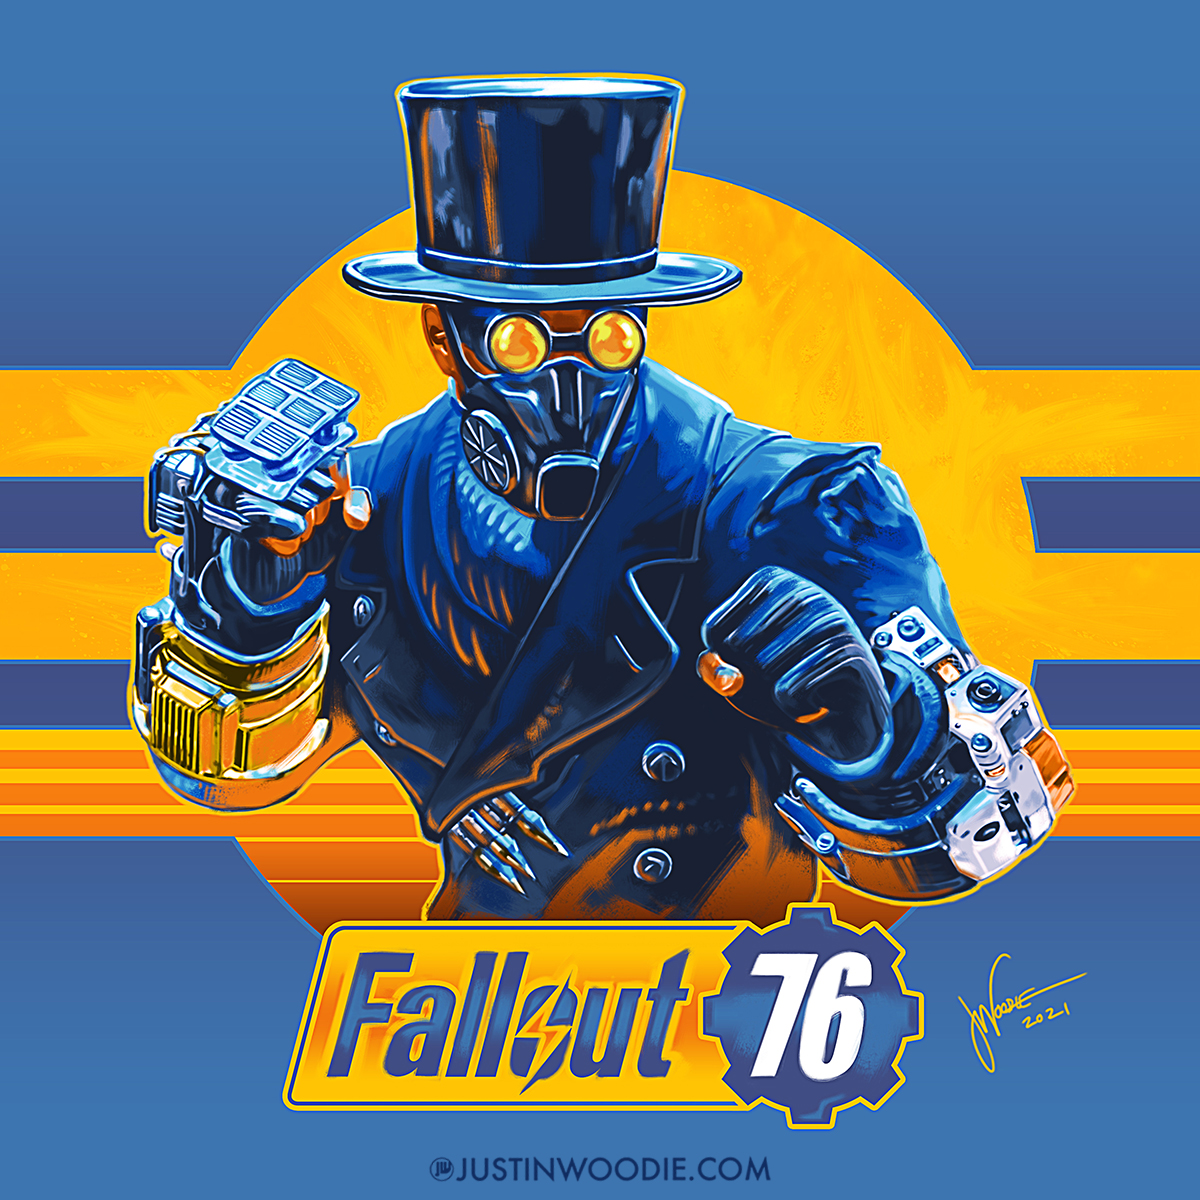 Fallout 76 Digital Illustration